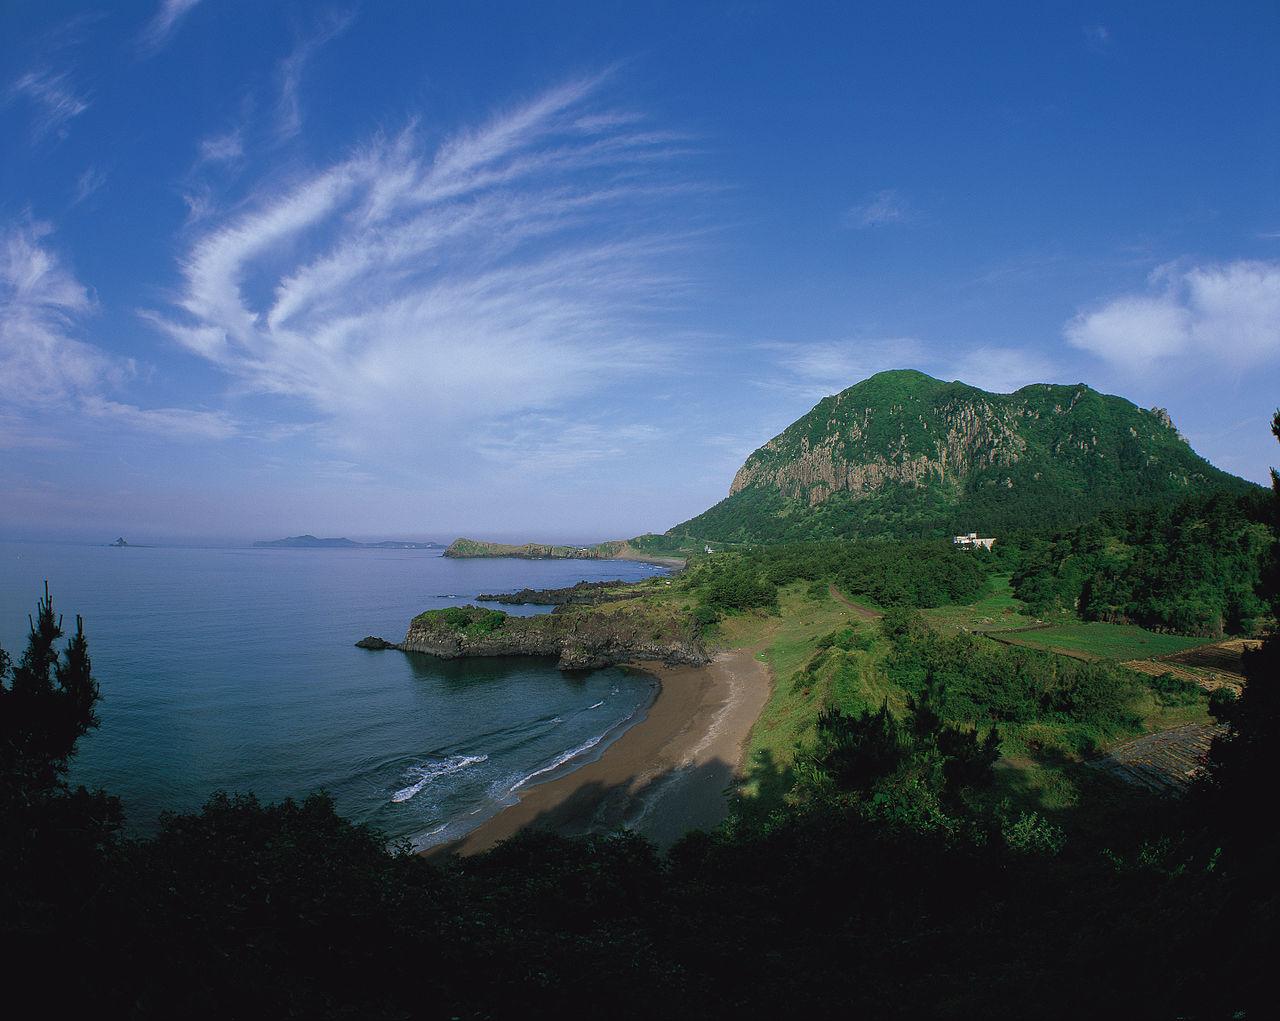 Île de Jeju (Corée du Sud) @ Korean Culture and Information Service / wikimedia commons